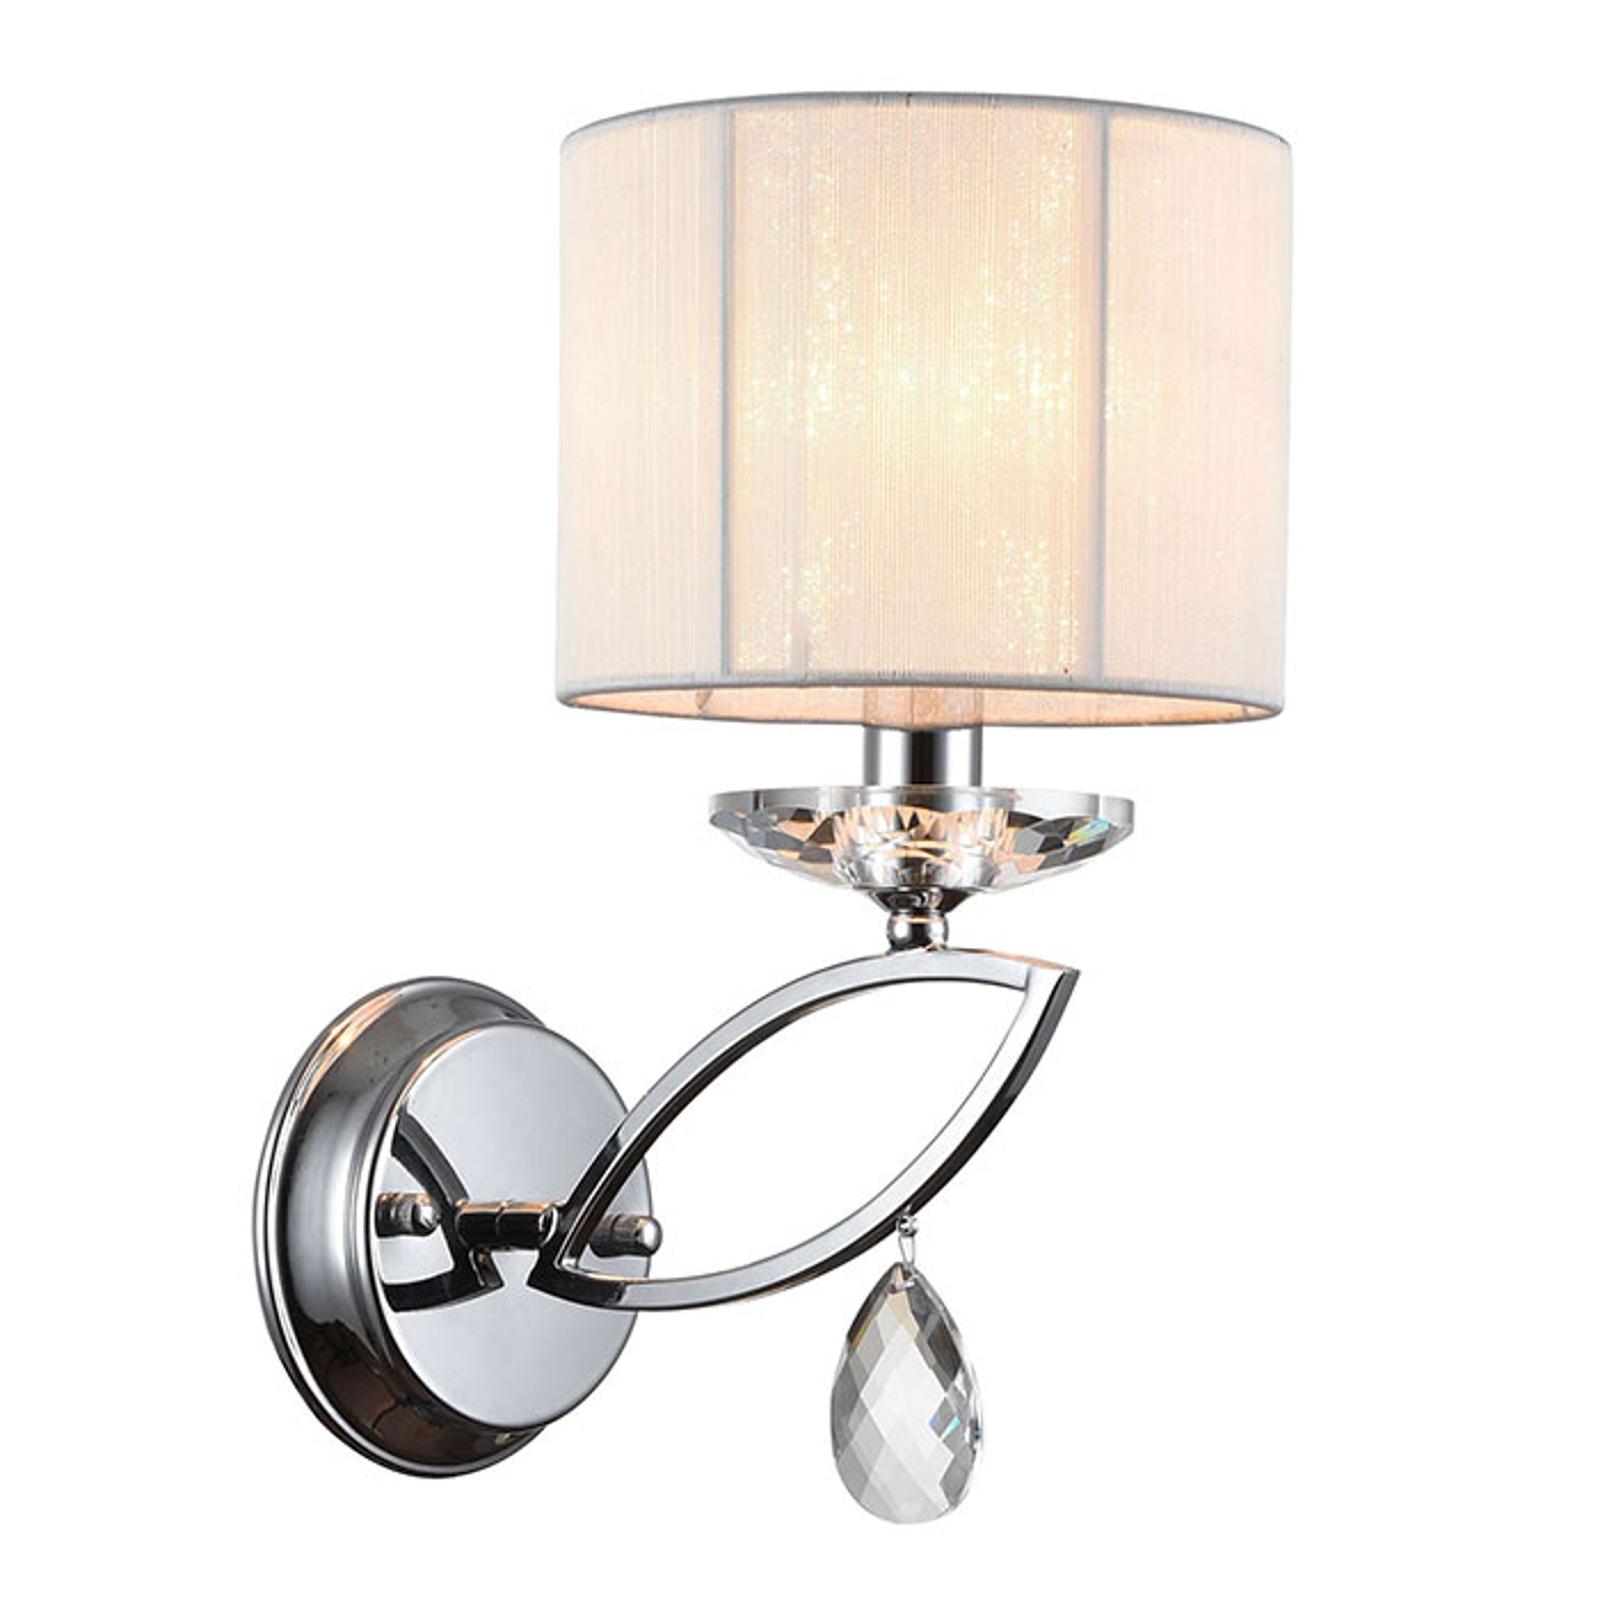 Wandlamp Miraggio met kristalbezetting